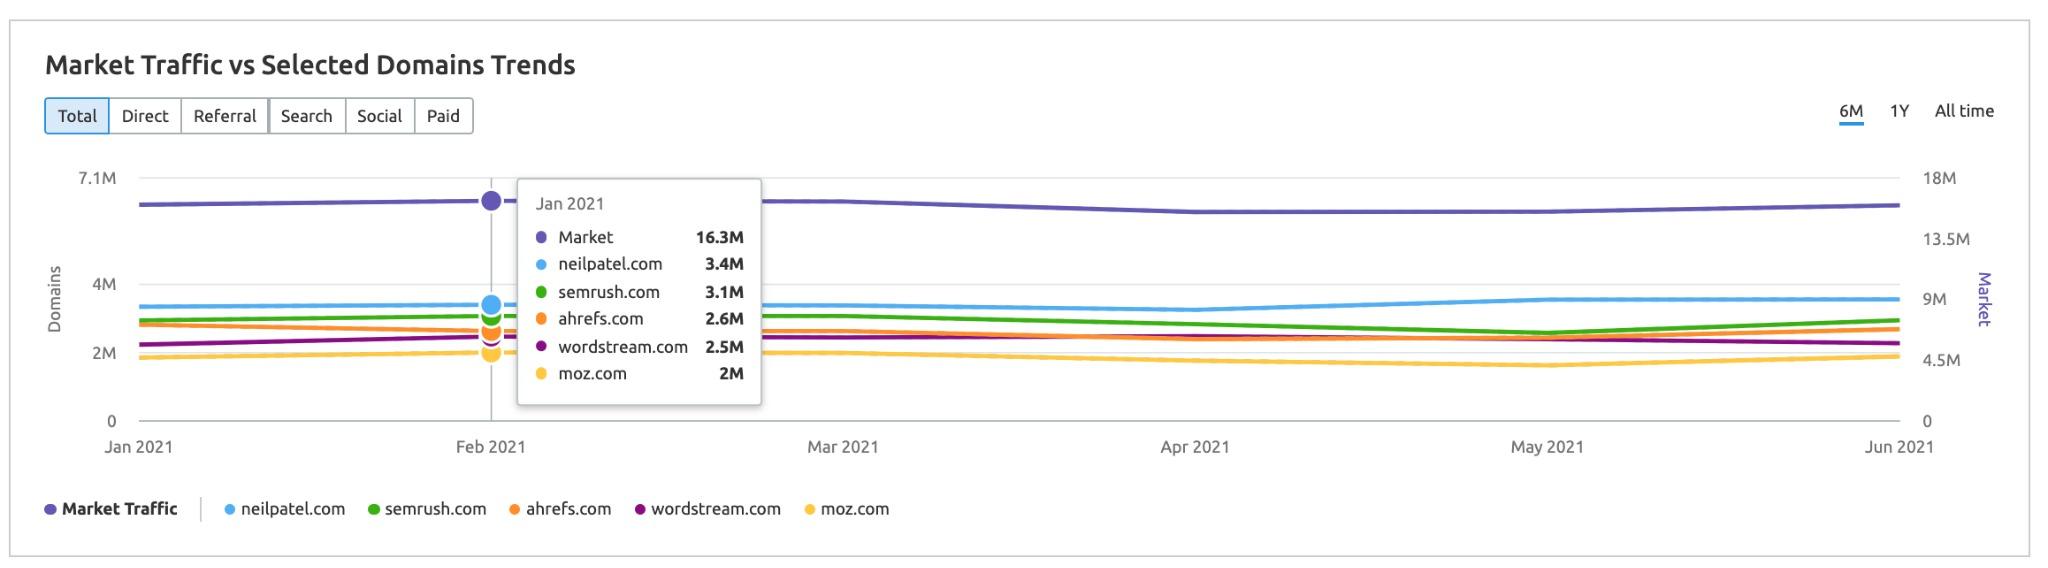 Market Explorer Benchmarking Report image 4